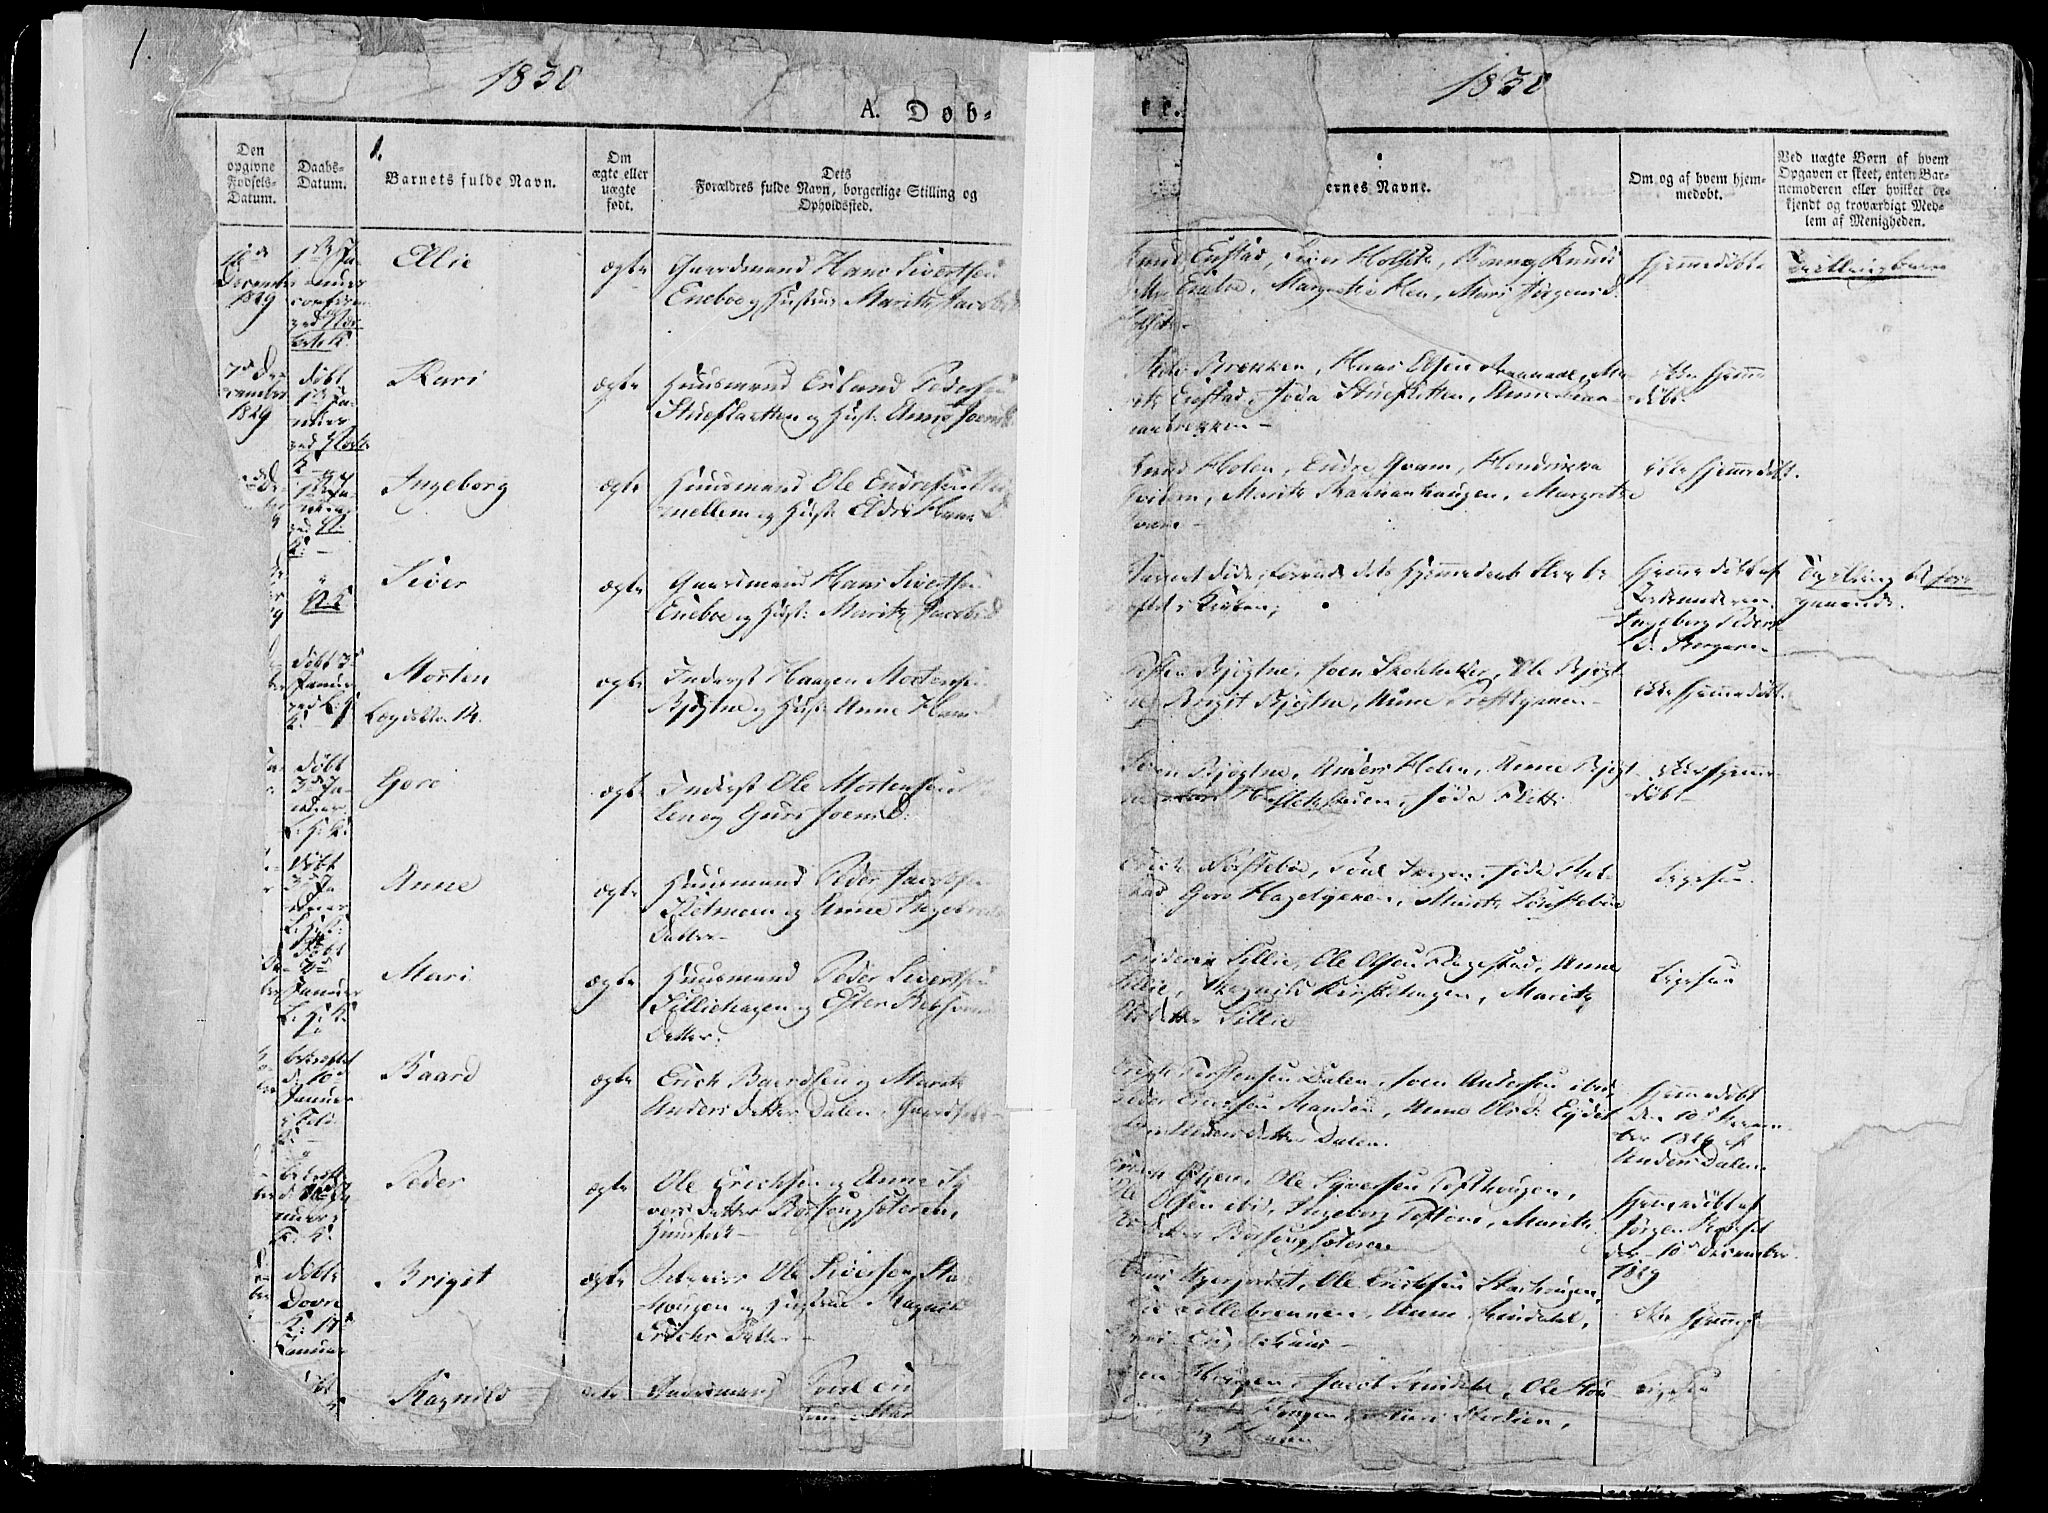 SAH, Lesja prestekontor, Parish register (official) no. 5, 1830-1842, p. 1